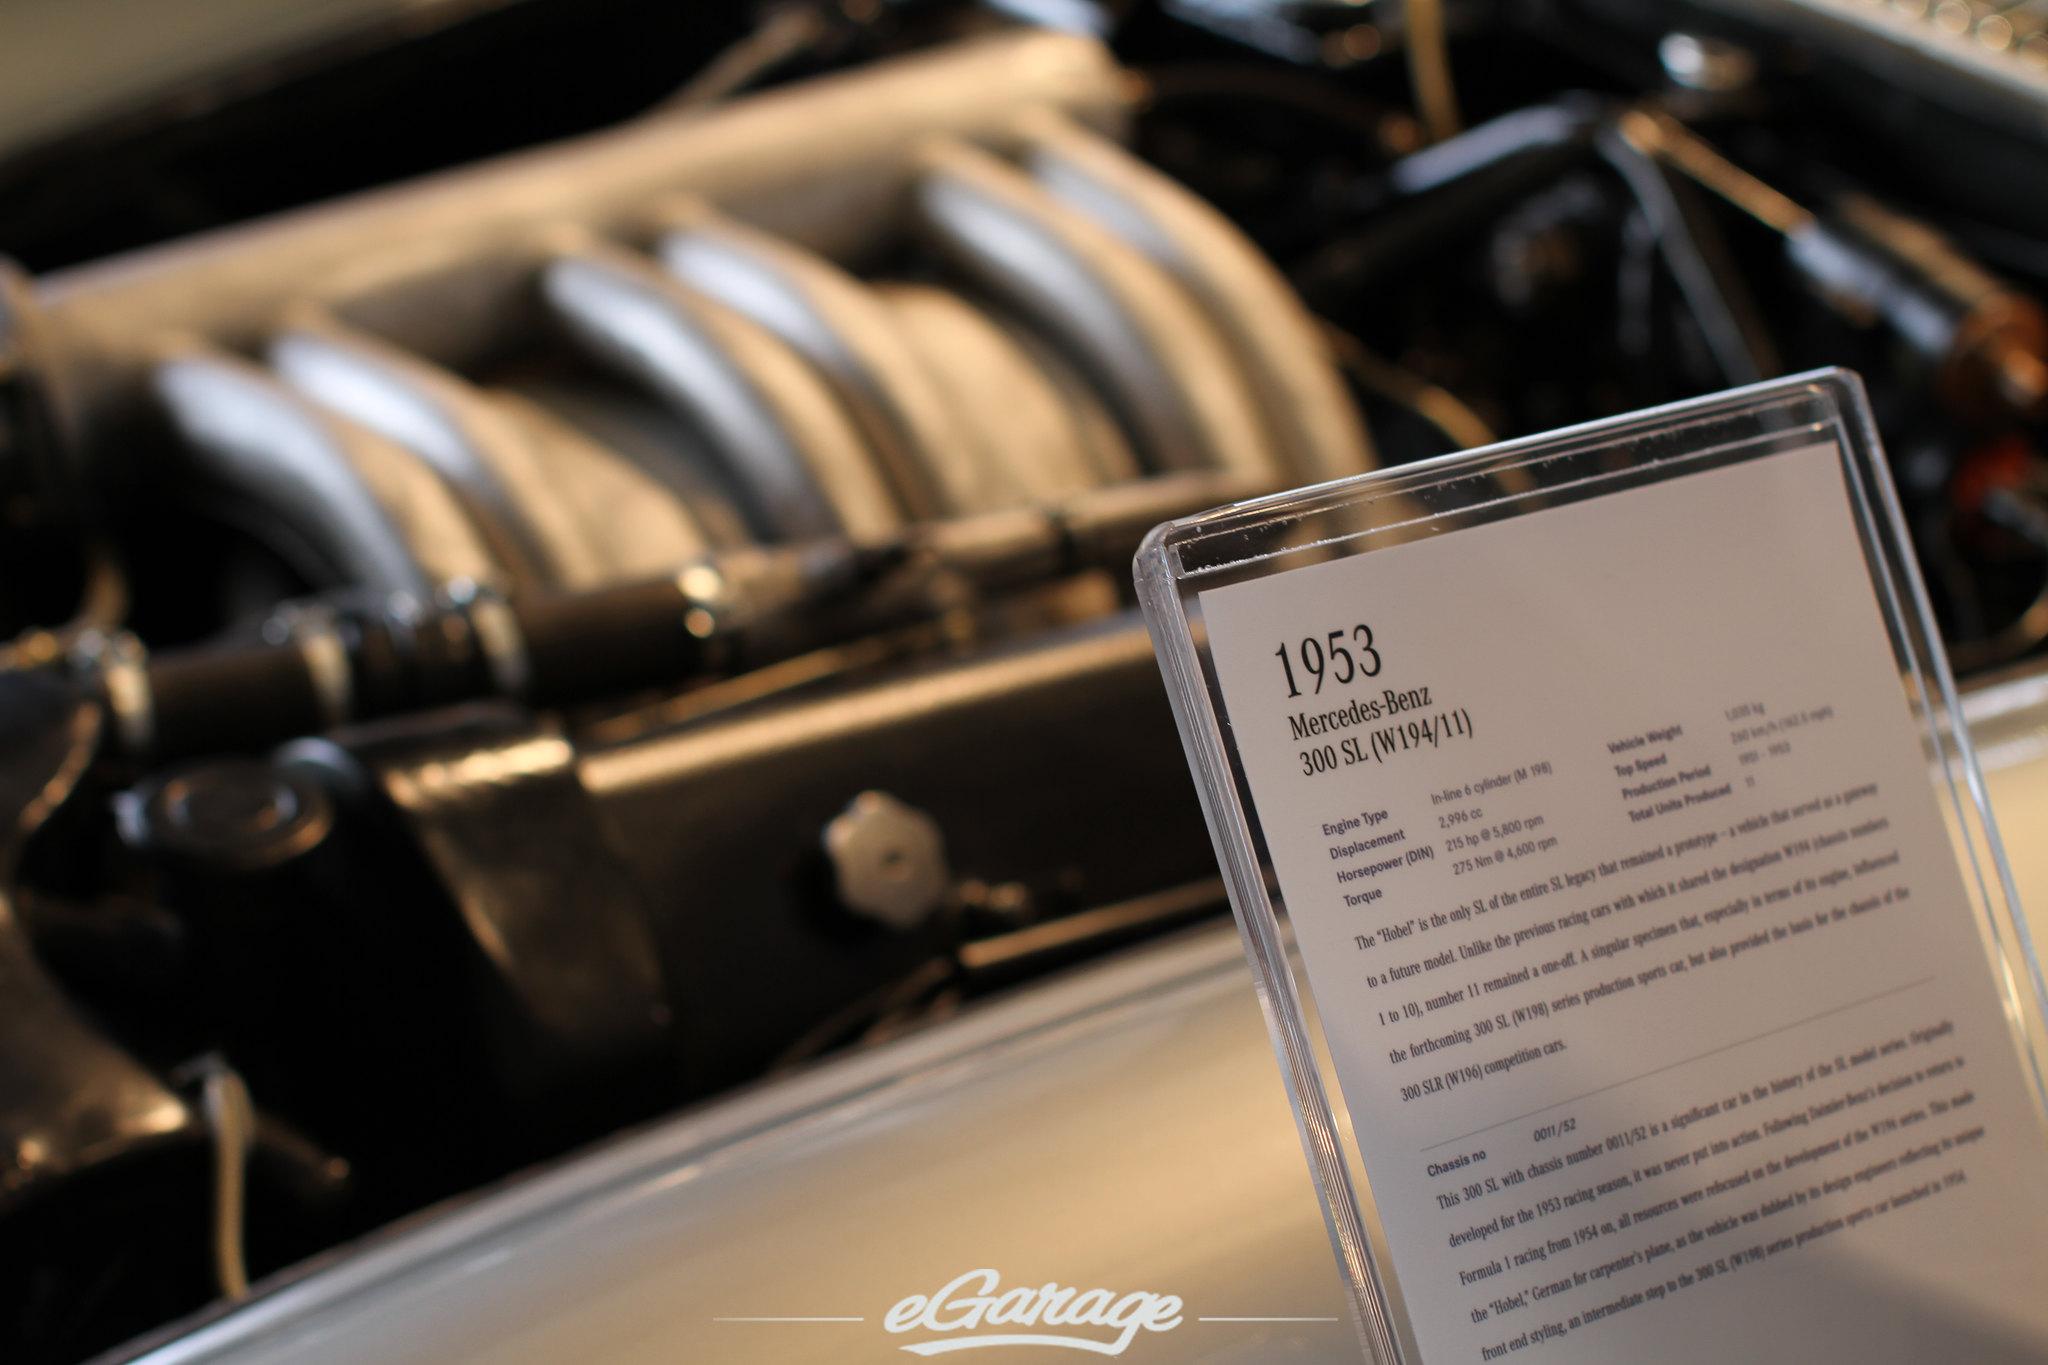 7828671108 775f13e98c k Mercedes Benz Classic